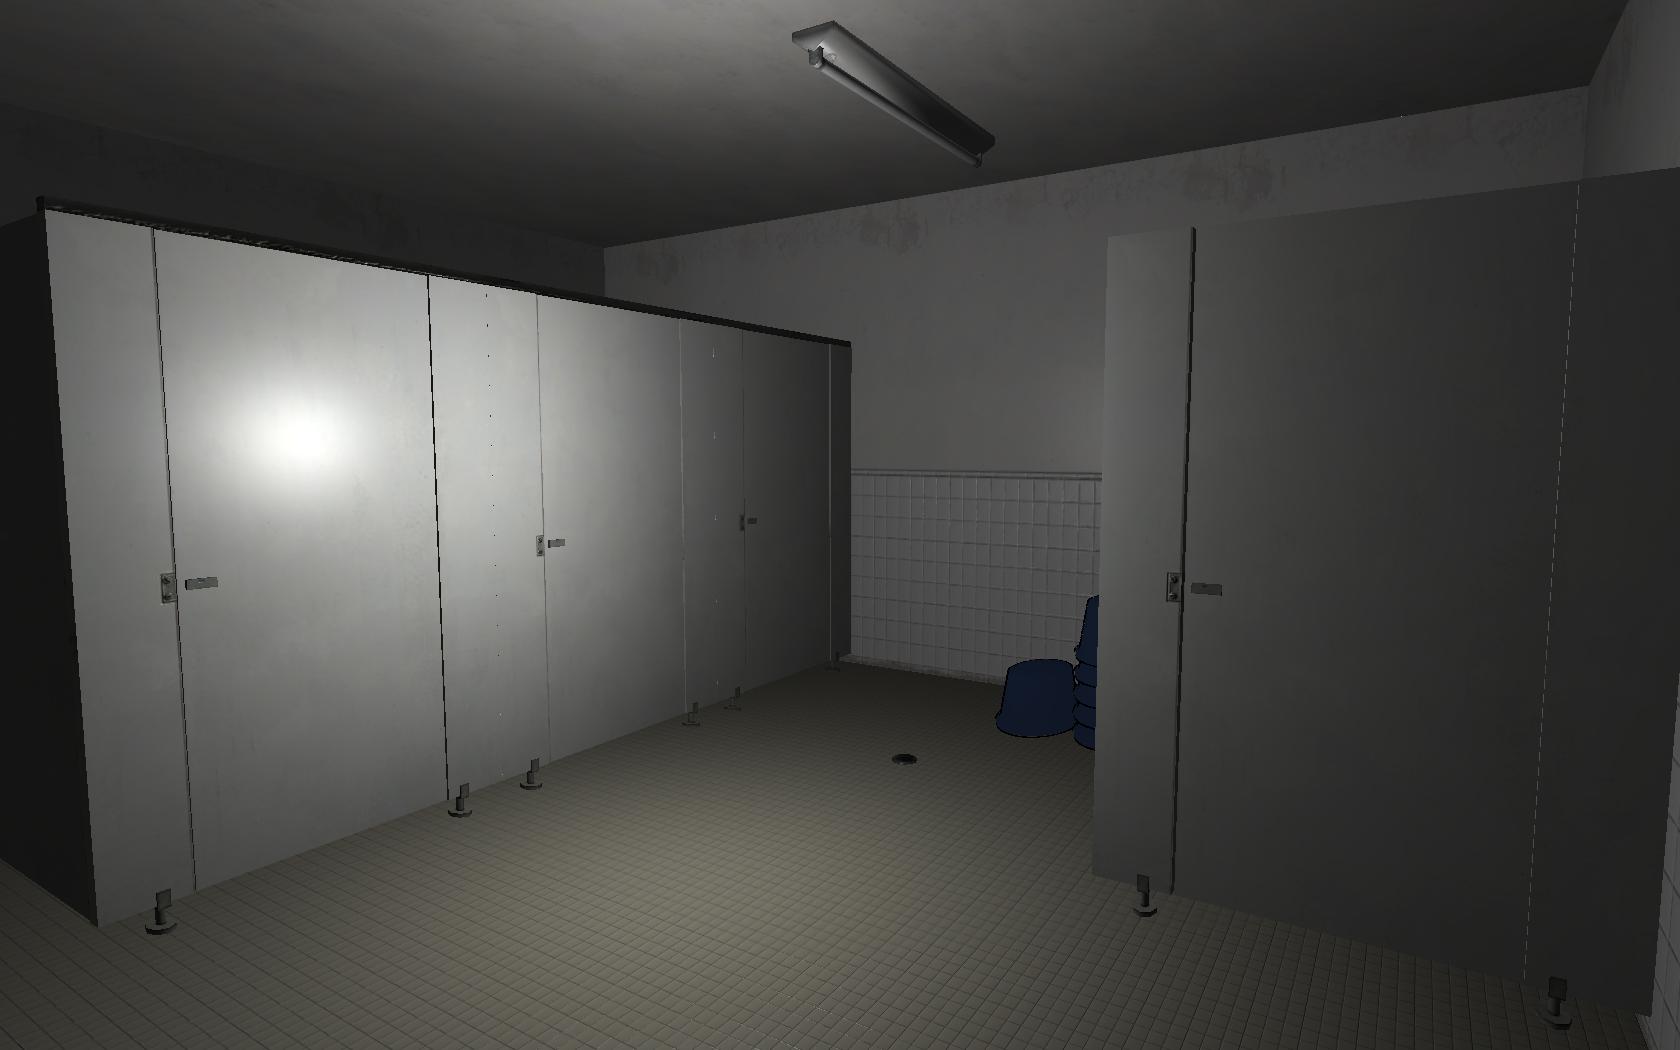 FemaleBathrooms2. Bathrooms   Yandere Simulator Wiki   Fandom powered by Wikia